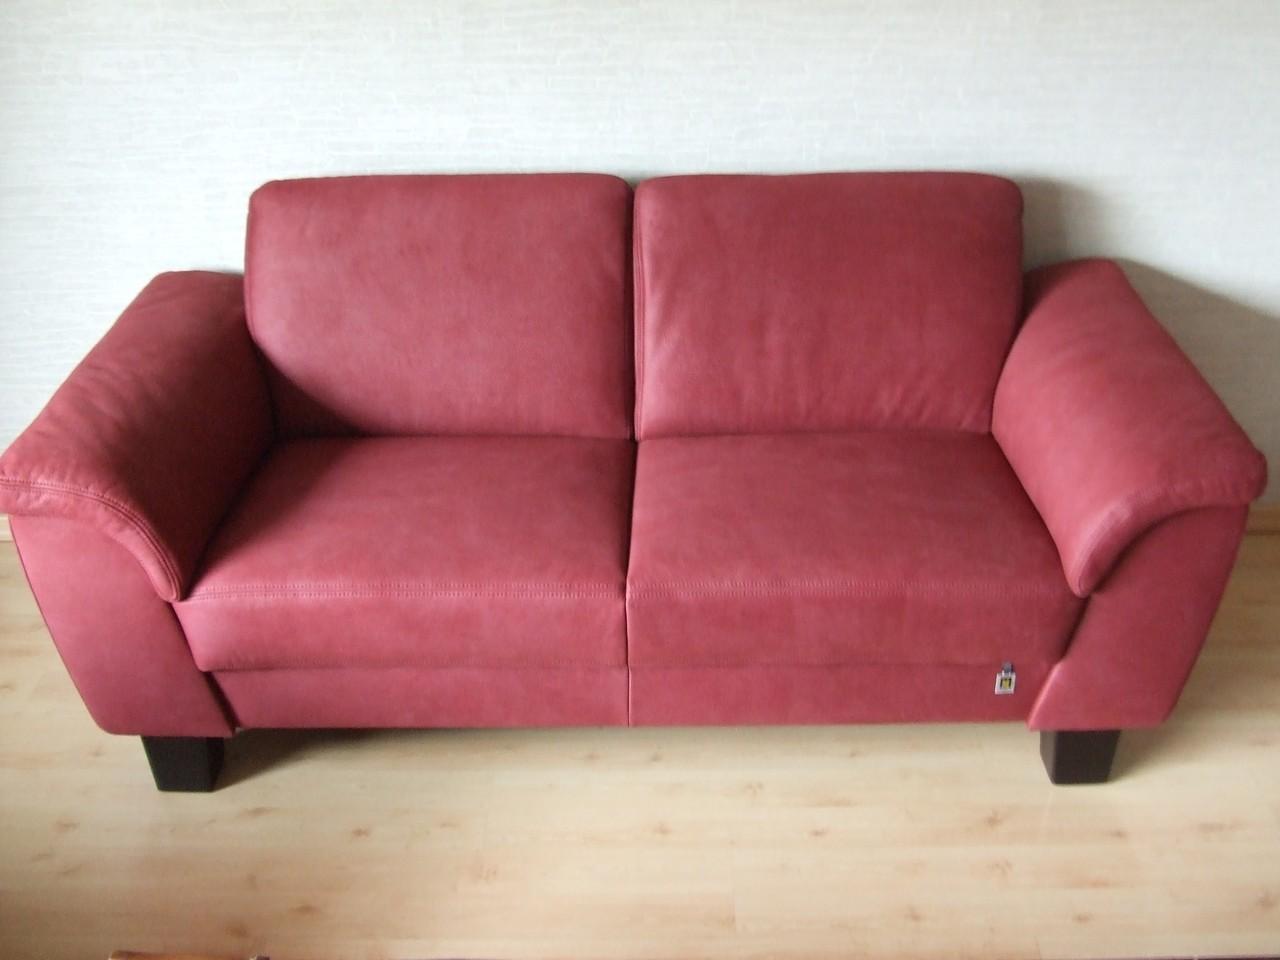 Geruche Aus Sofa Entfernen Ideen Flecken Aus Dem Sofa Entfernen Quelle Imago Gold Natural